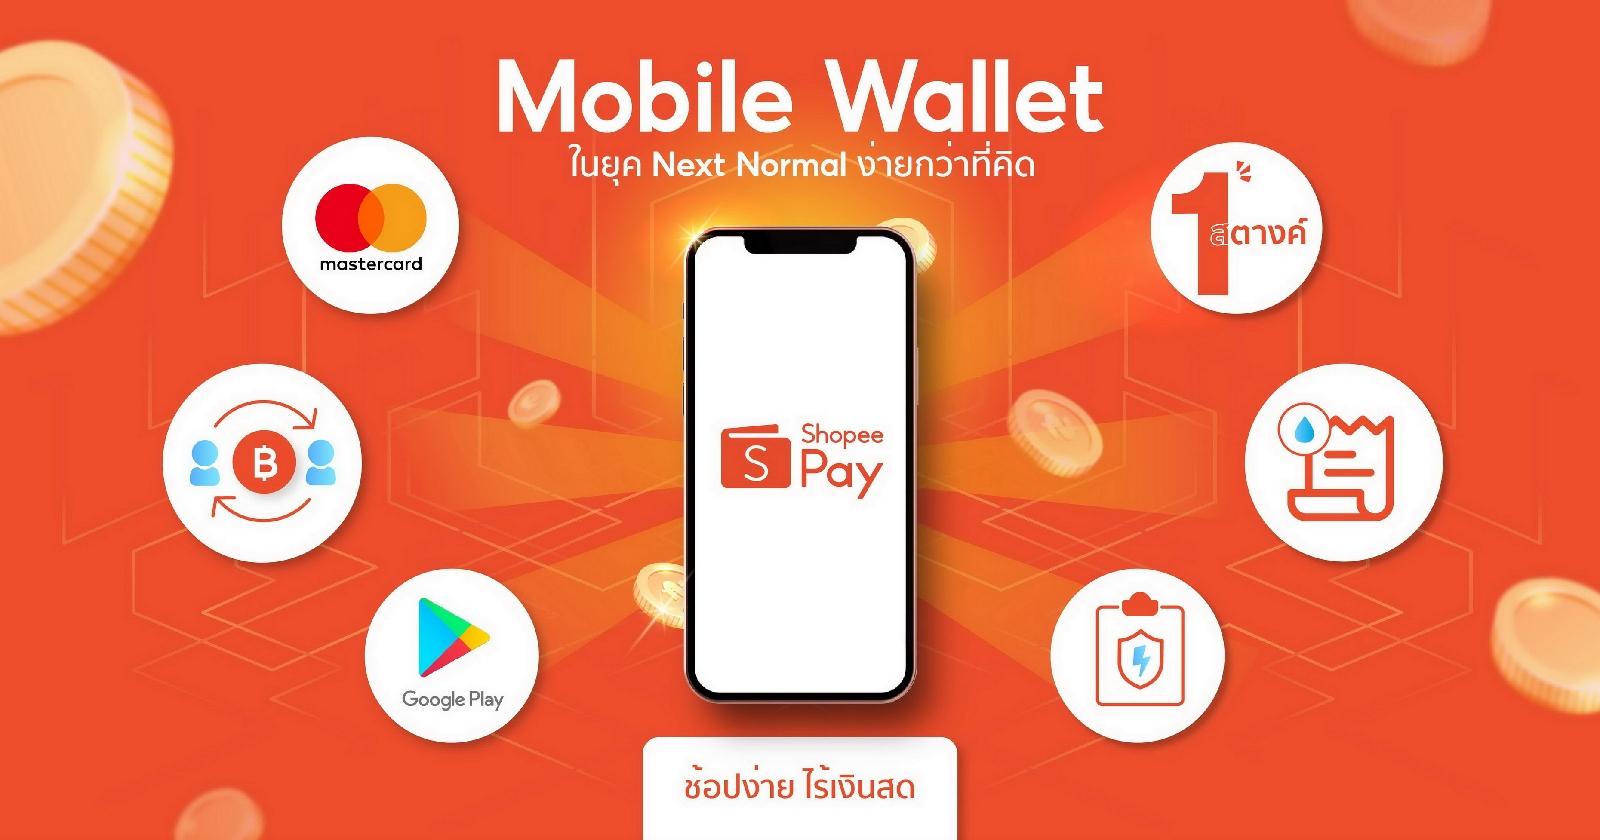 ShopeePay Mobile Wallet เพื่อการใช้ชีวิตในยุค Next Normal ที่ง่ายกว่า